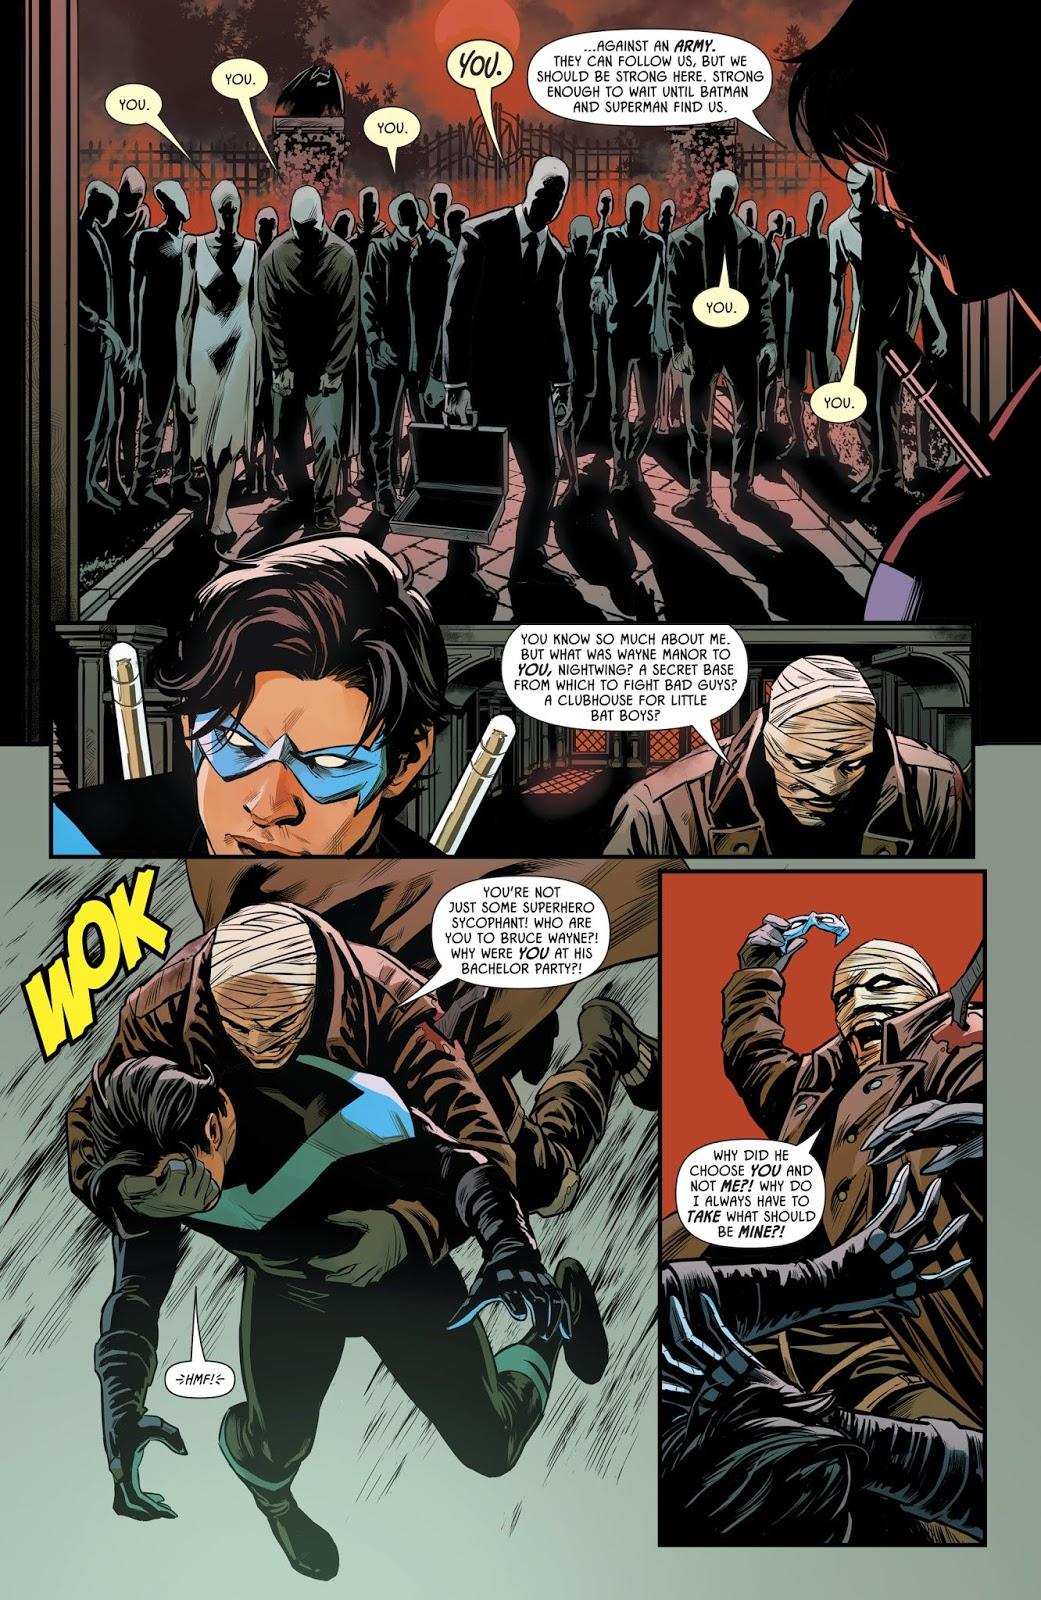 Hush Copies Dick Grayson's Face